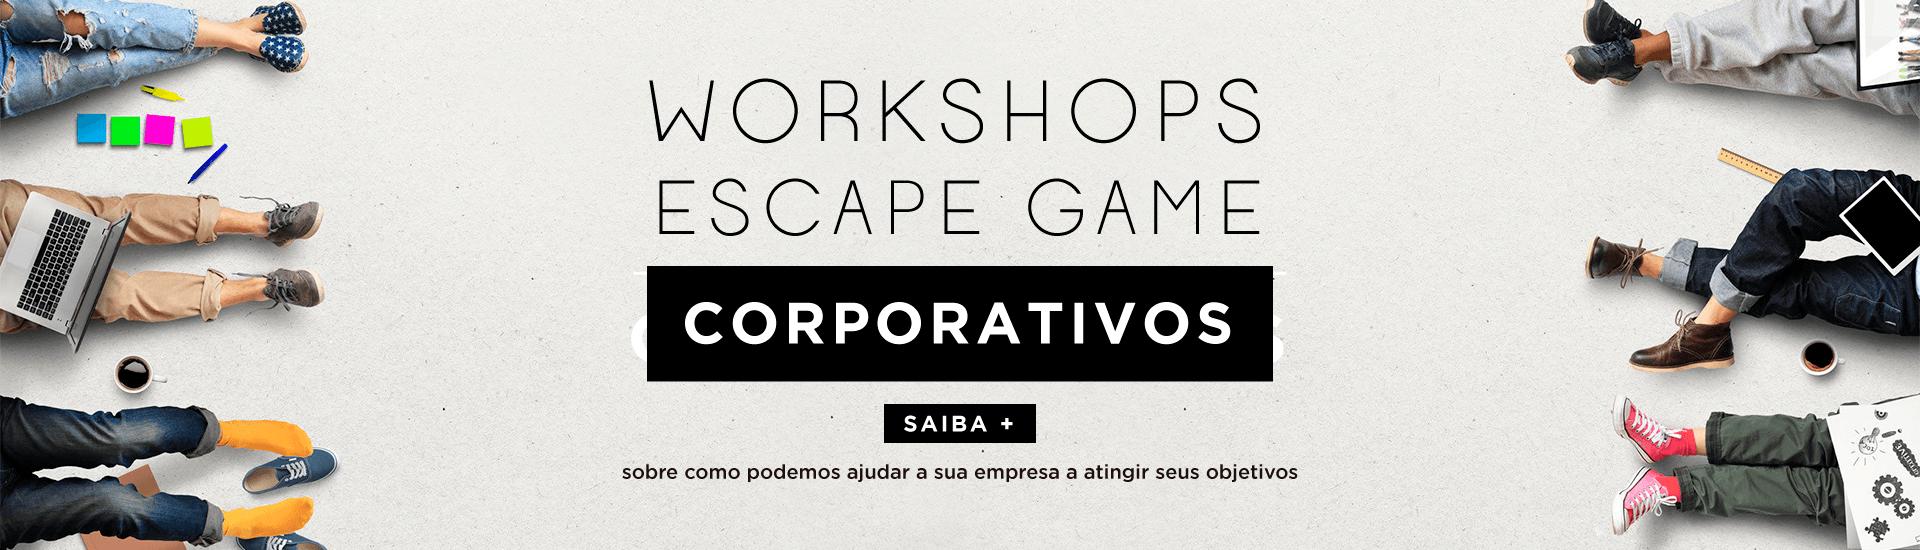 Workshop Cortorativo, bg, Chave-Mestra Escape Game Gramado, Chave Mestra Escape Game Gramado, chavemestra, chave-mestra, escape game, escape room, gramado